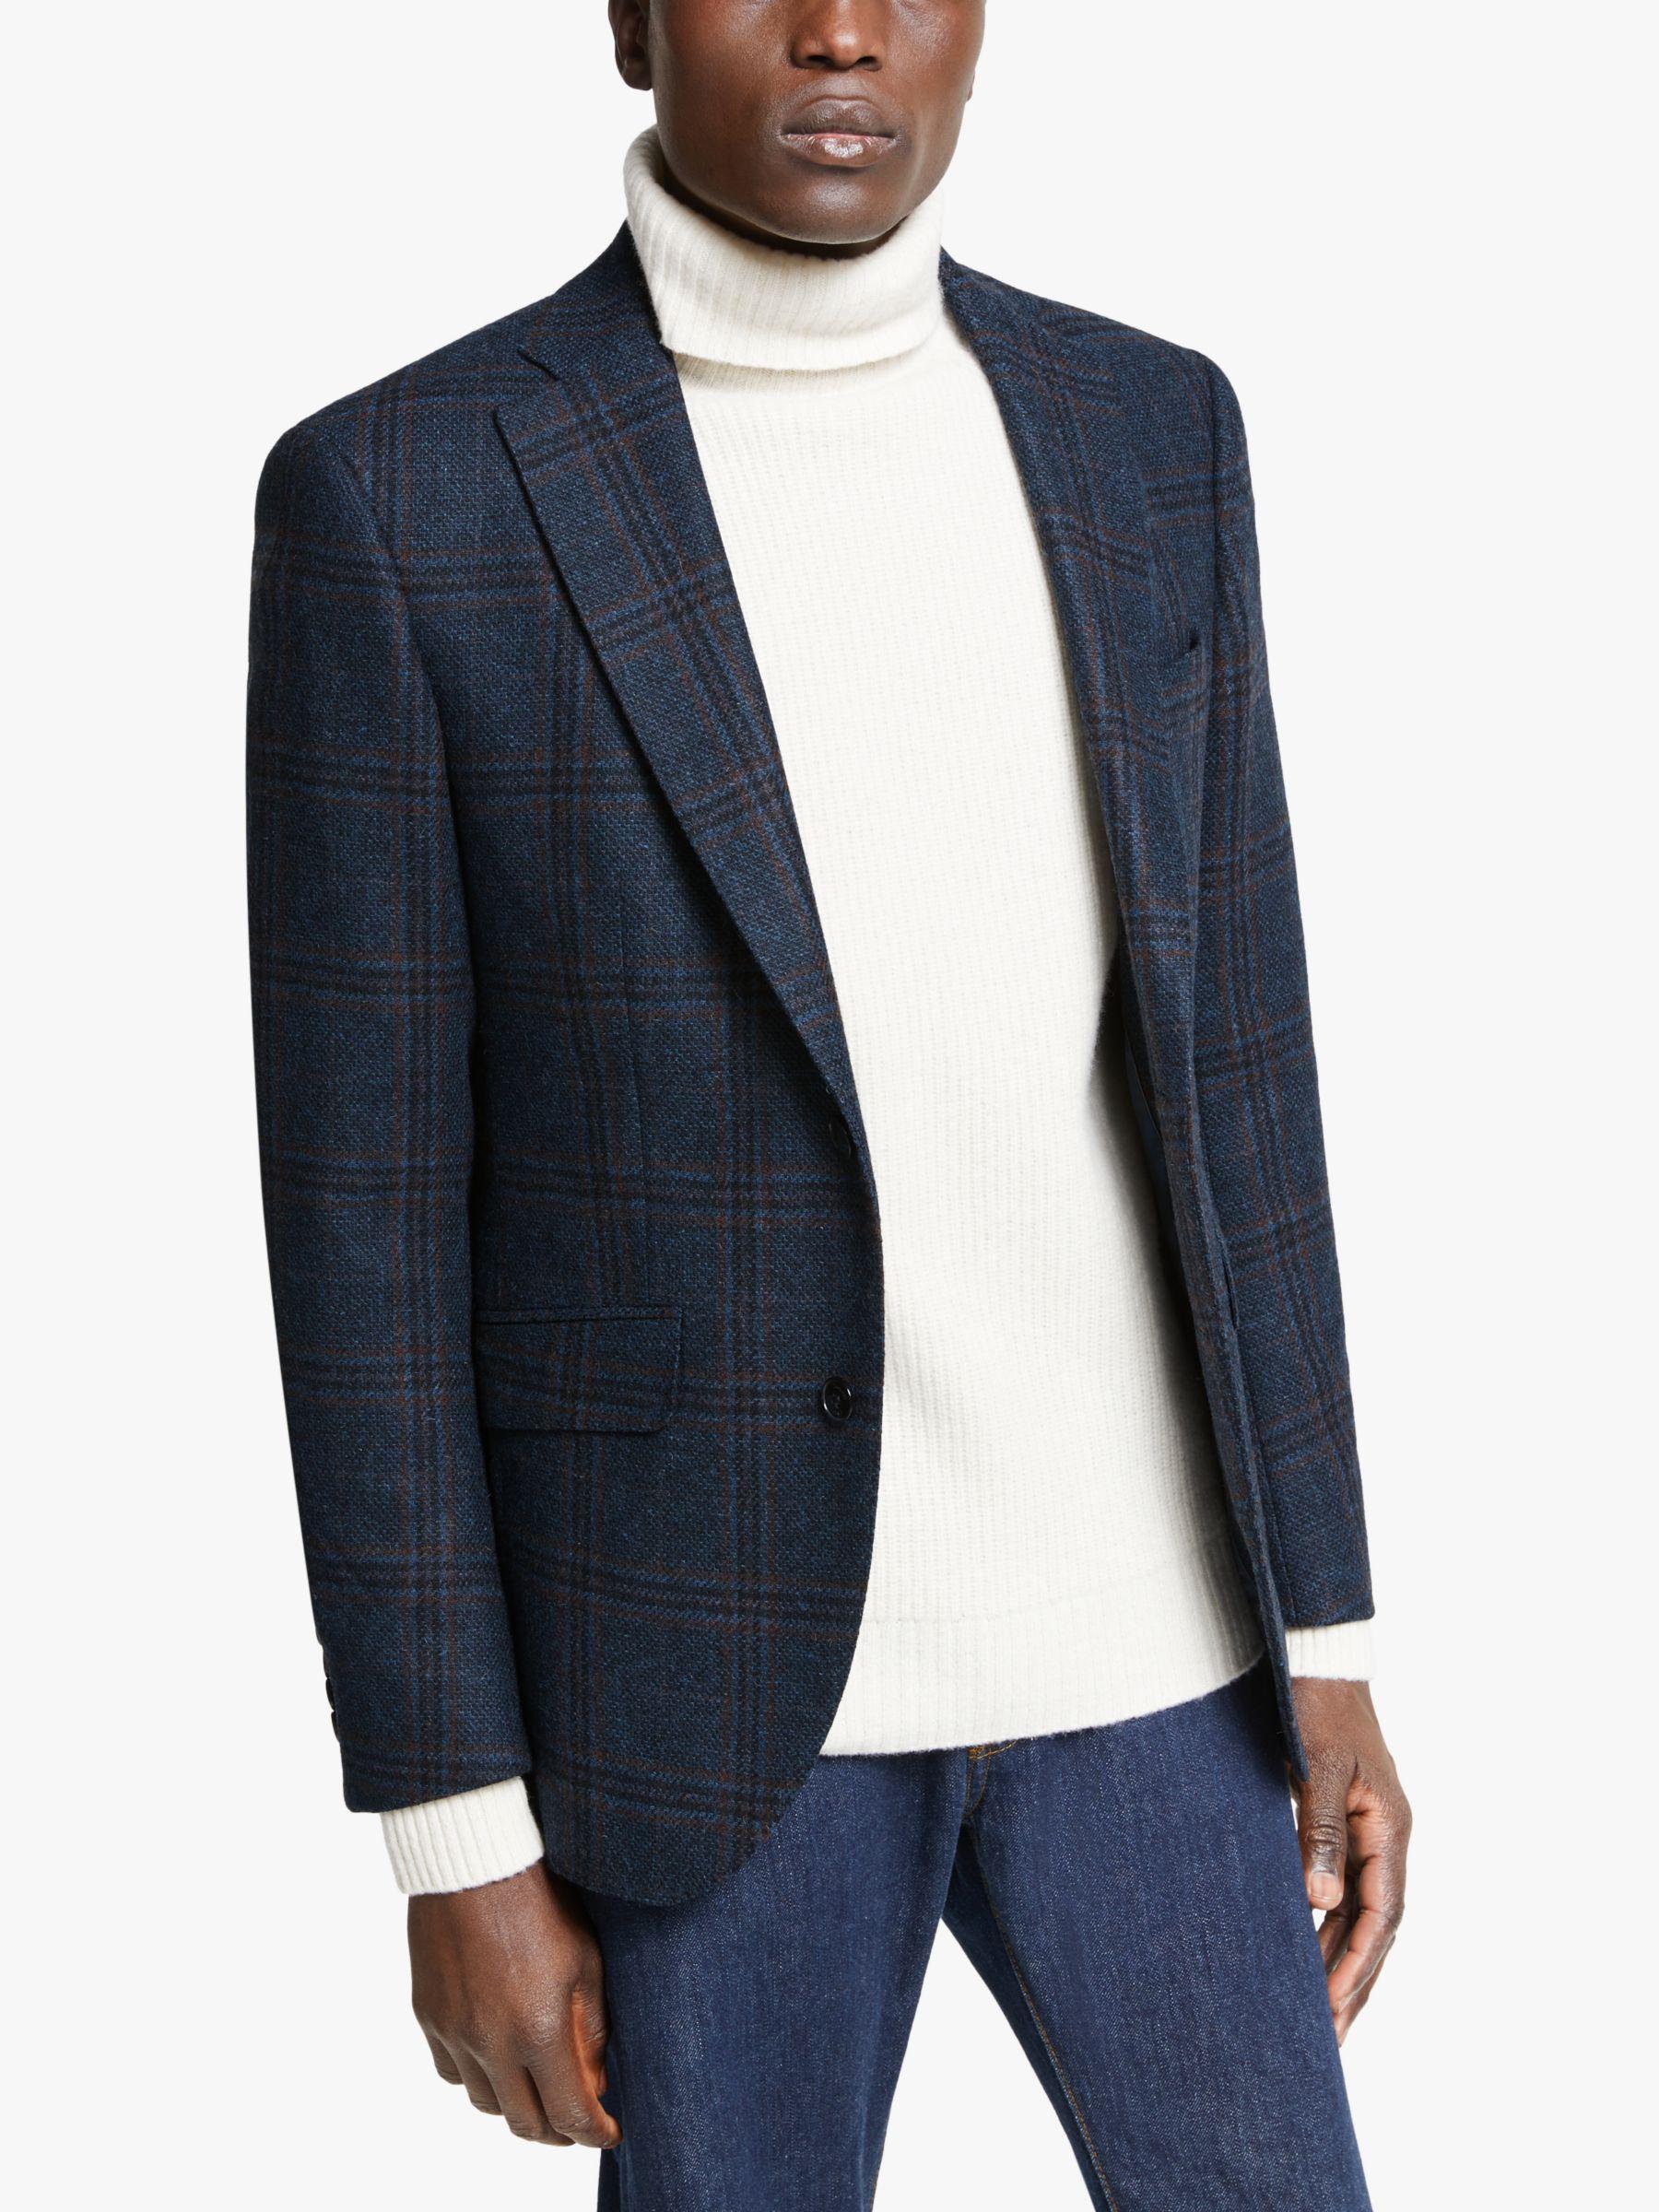 Hackett London Hackett London Wool Tweed Check Blazer, Navy/Blue